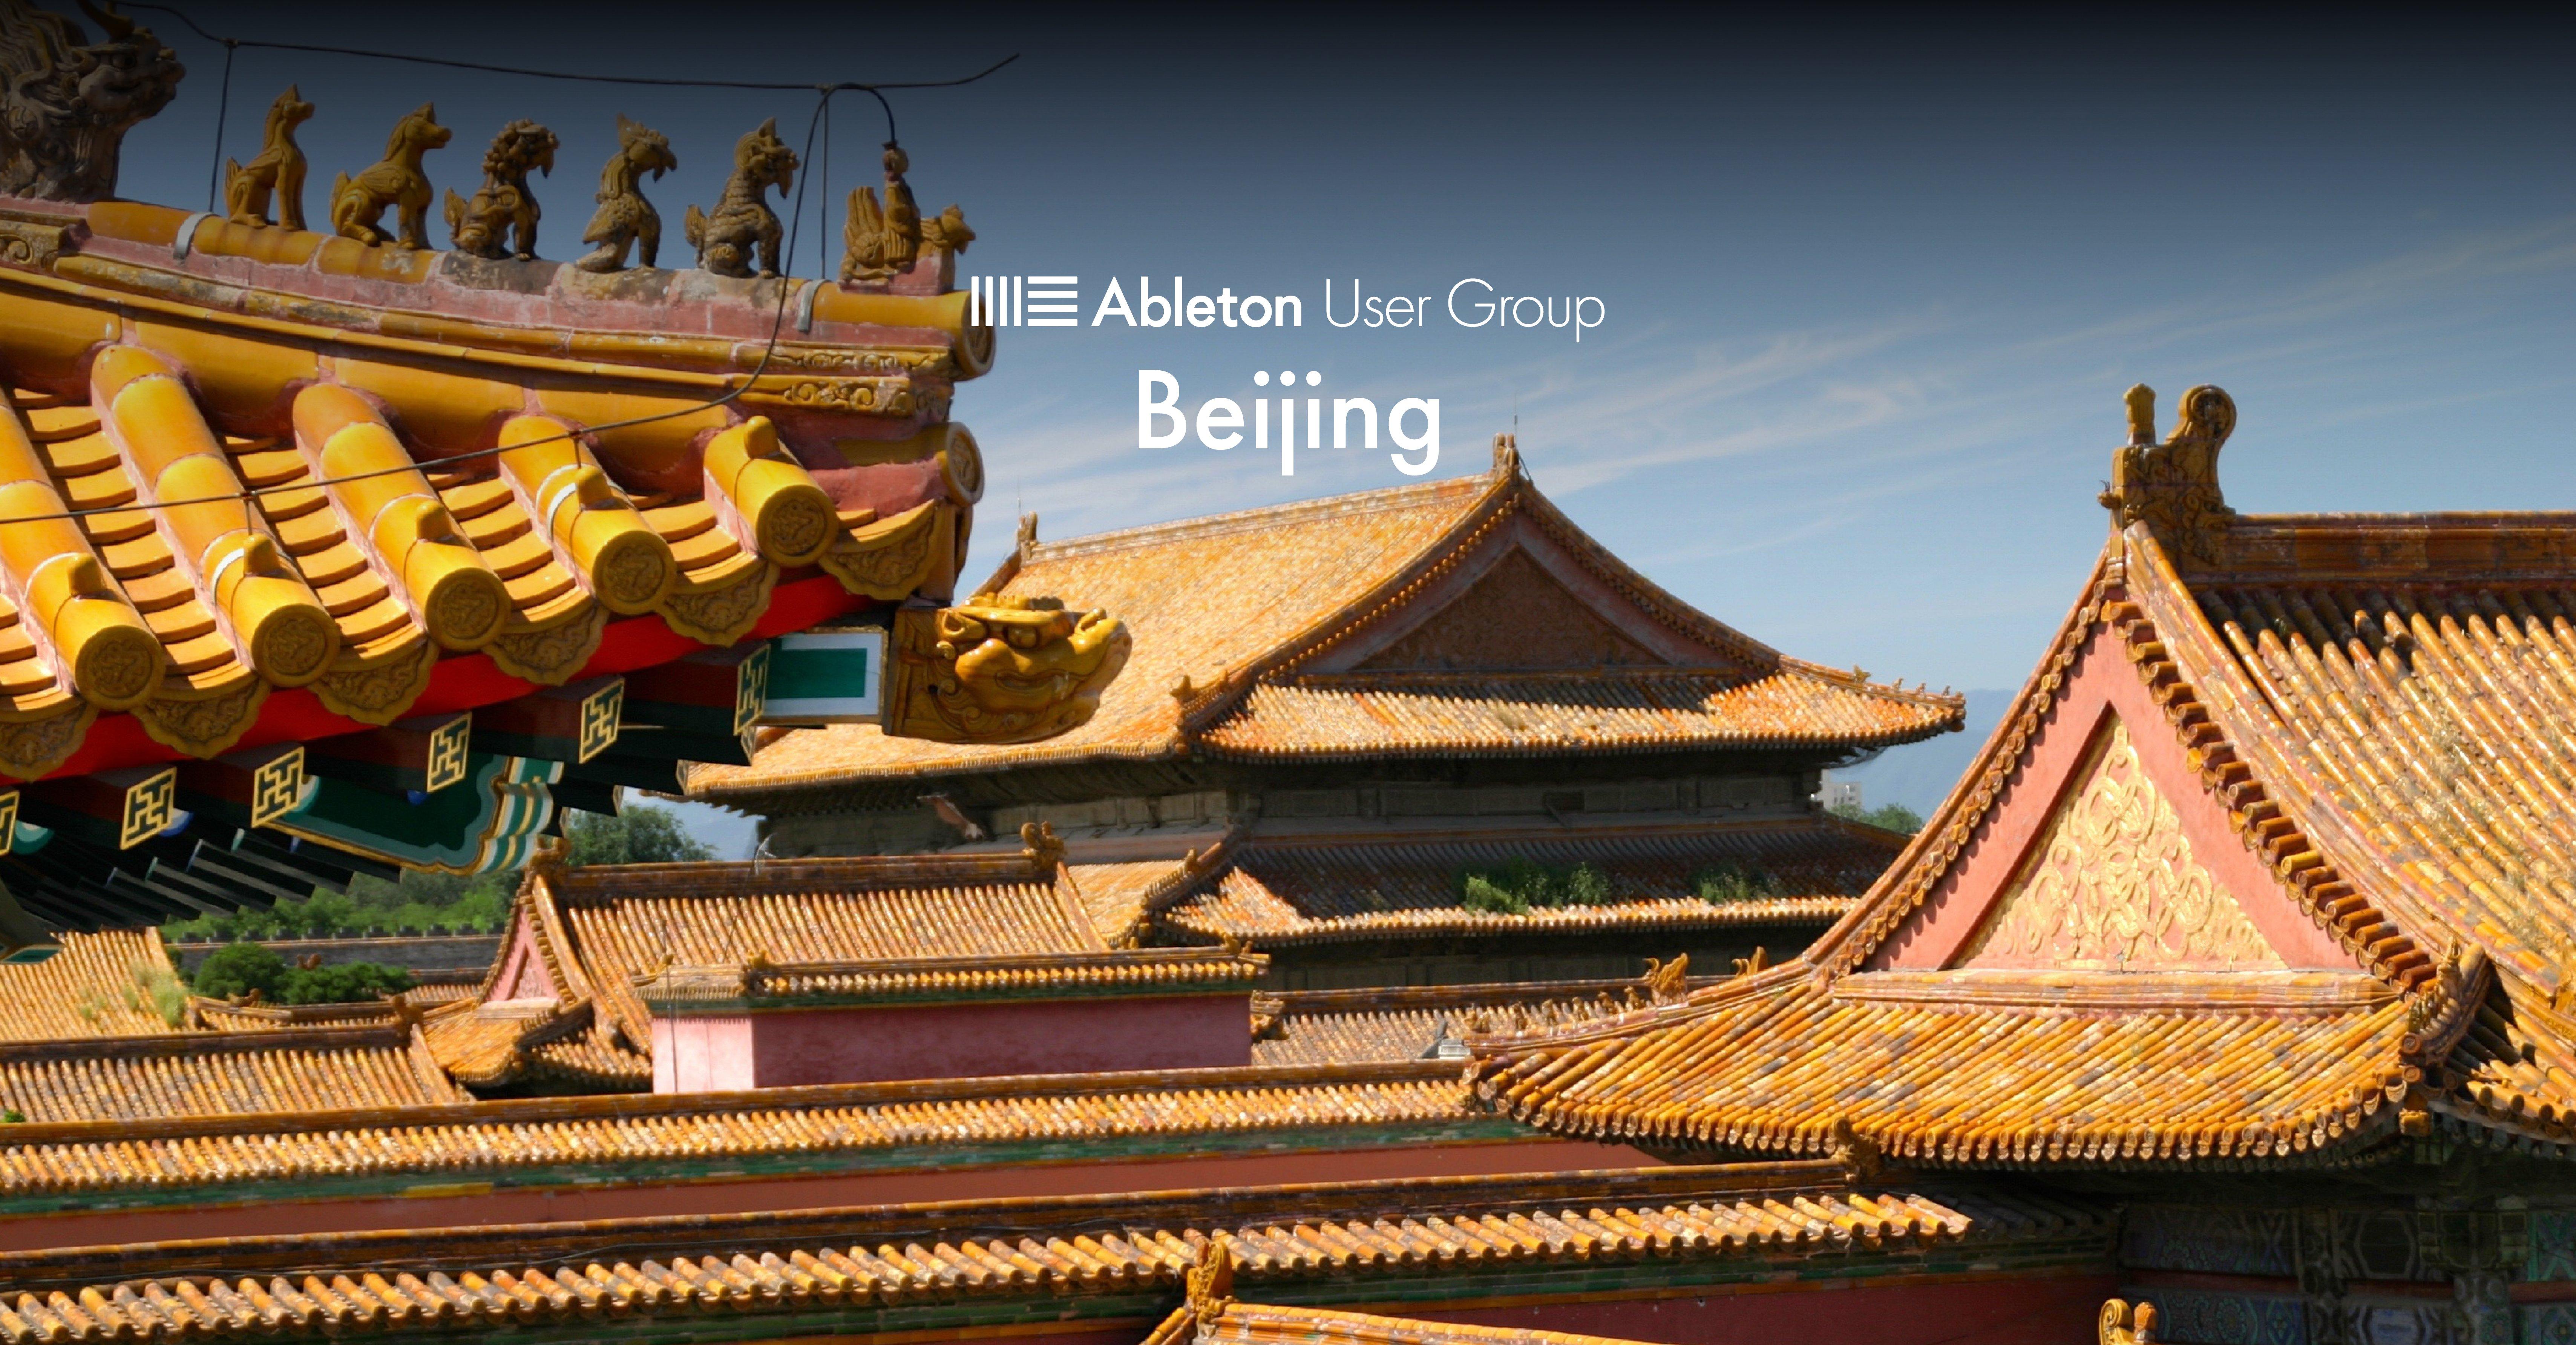 Beijing Ableton User Group FB Banner.png